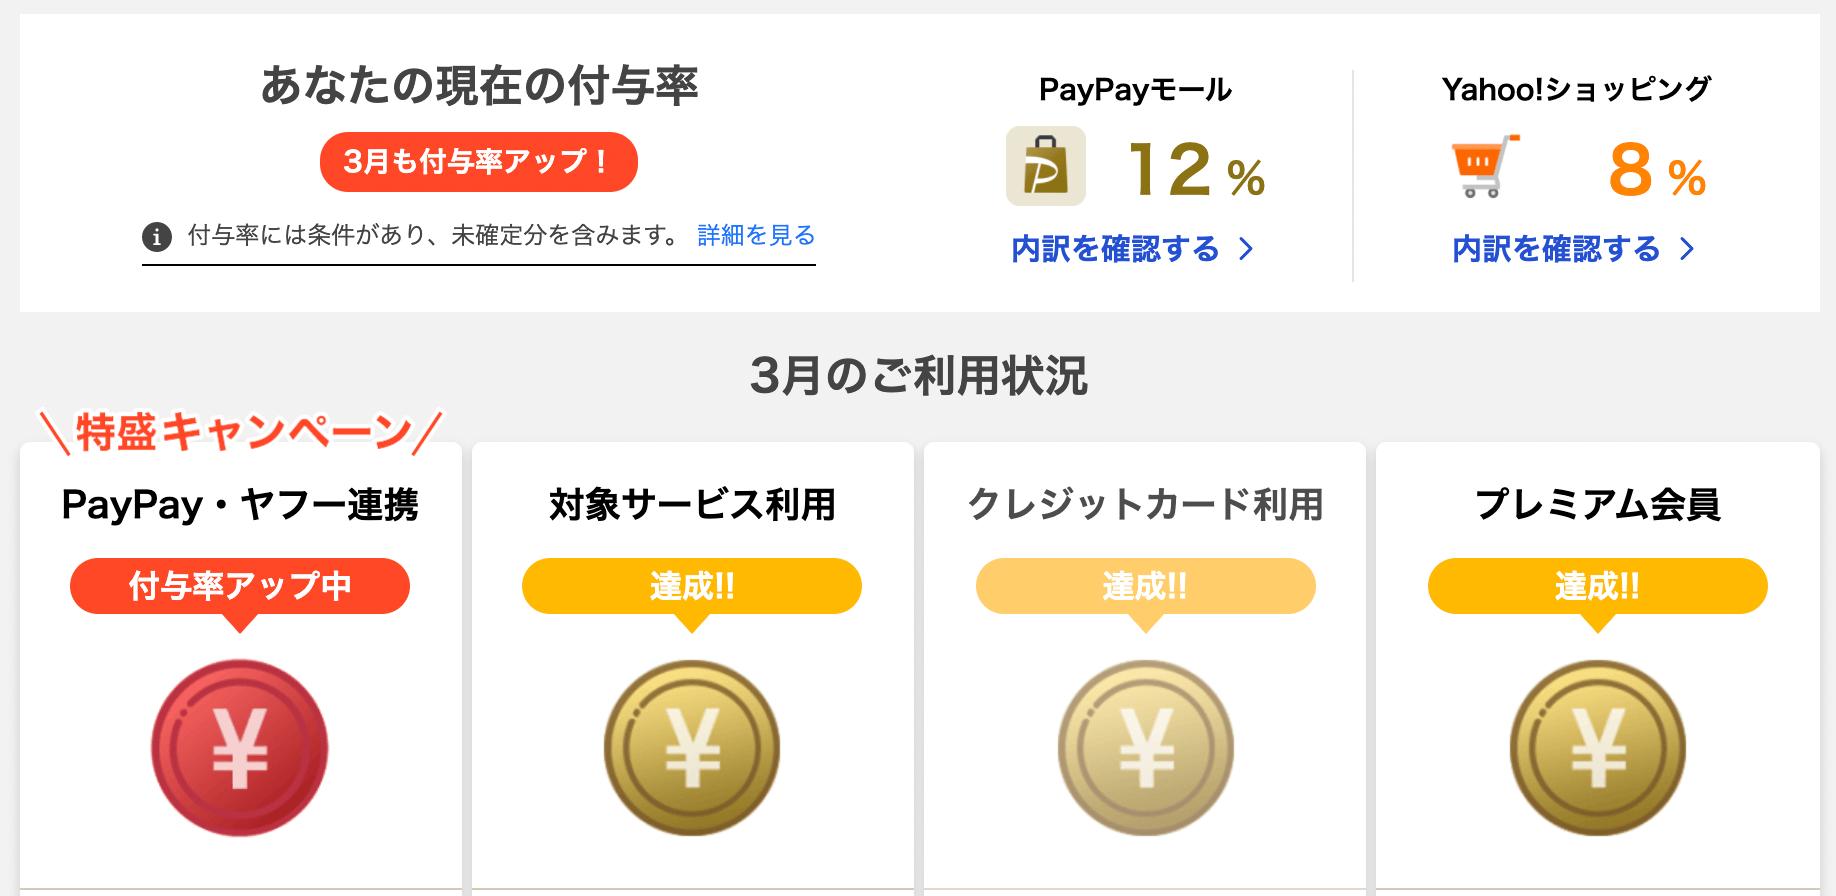 PayPay STEP攻略